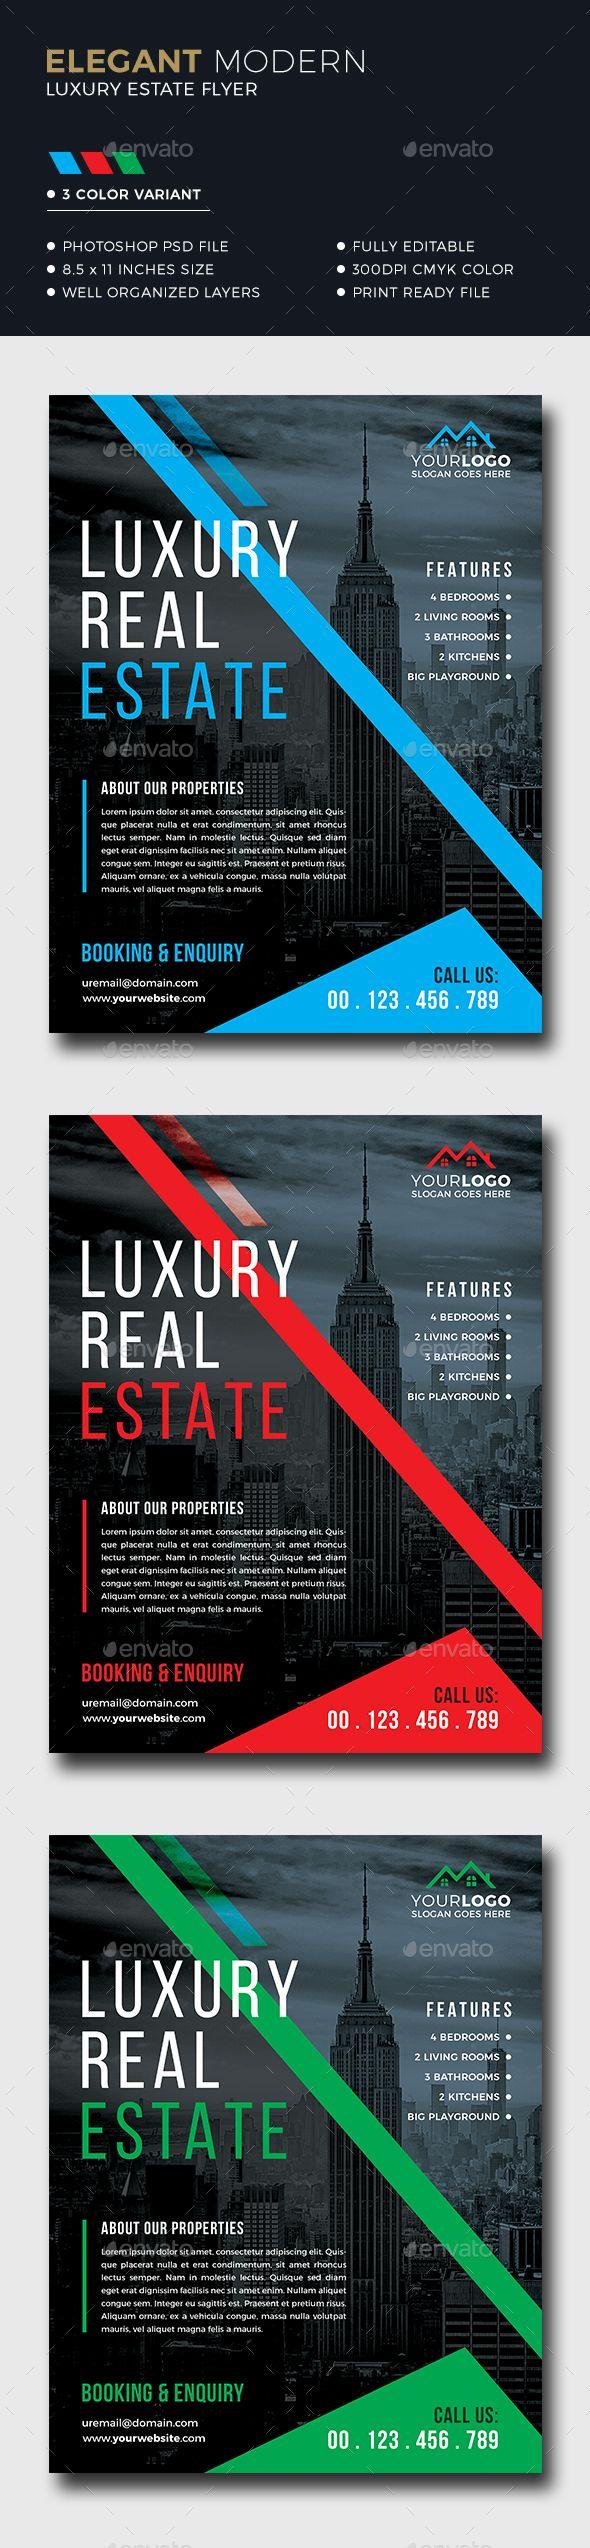 #Real #Estate #Flyer - Corporate Flyers Download here: https://graphicriver.net/item/real-estate-flyer/20288433?ref=alena994